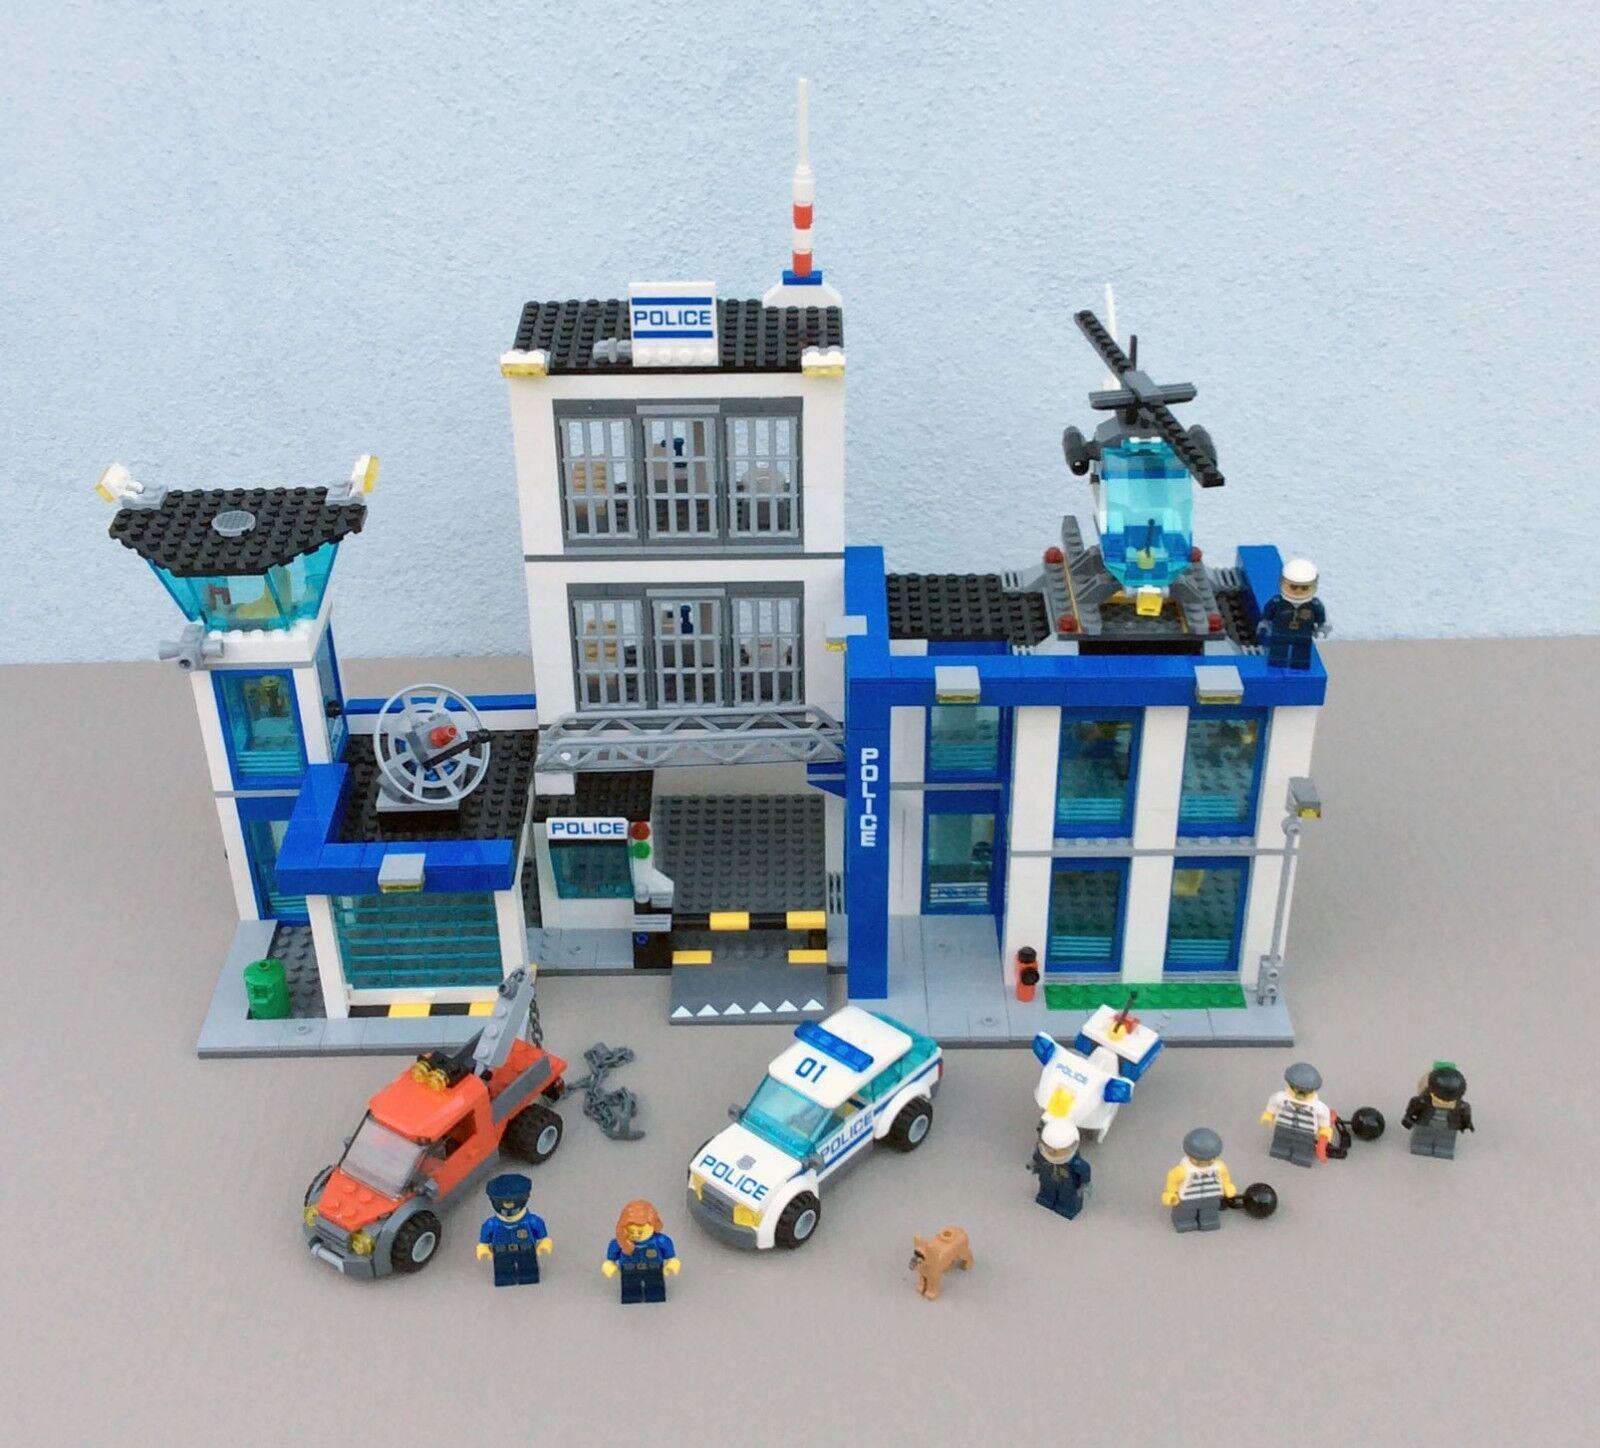 LEGO CITY - POLICE - - - 60047 - Police Station (2014) - JEU - JOUET - BRIQUES 3893a7